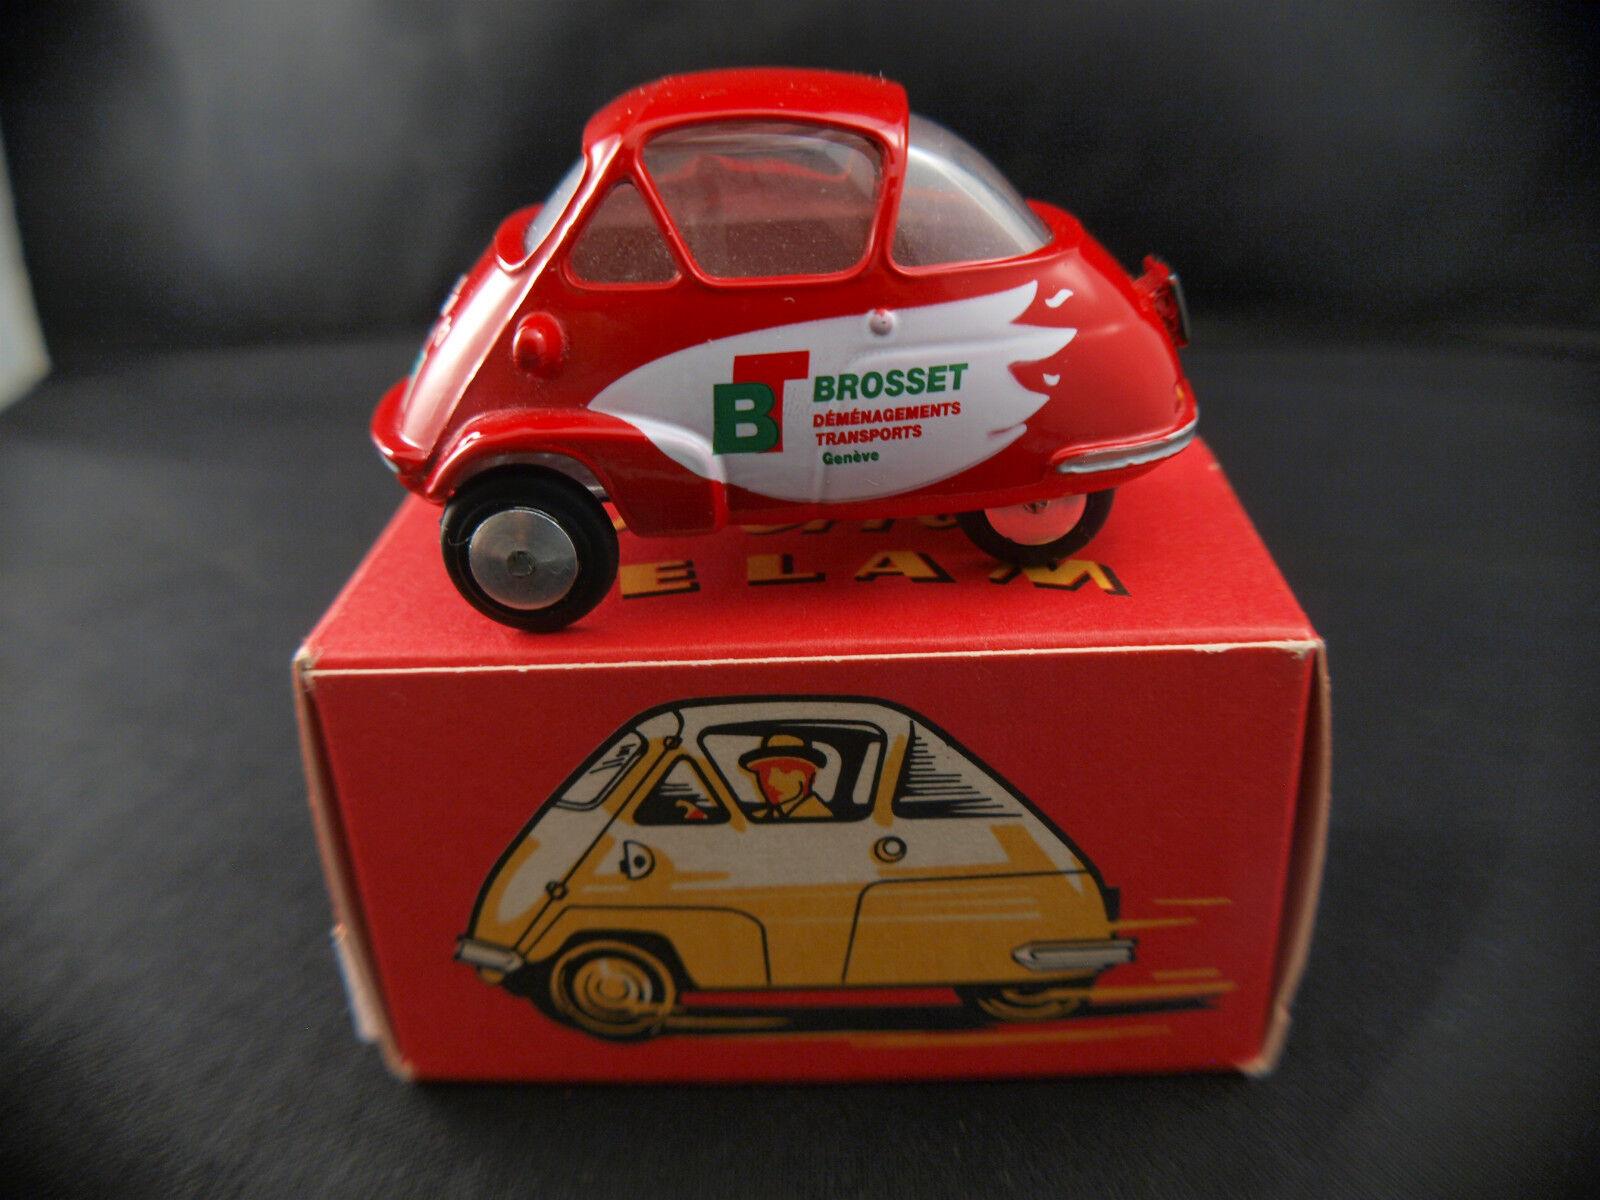 Hay más marcas de productos de alta calidad. Quiralu Isetta Velam tranDeporte BROSSET BROSSET BROSSET Genève 1 40 neuf en boîte   boxed mint  productos creativos